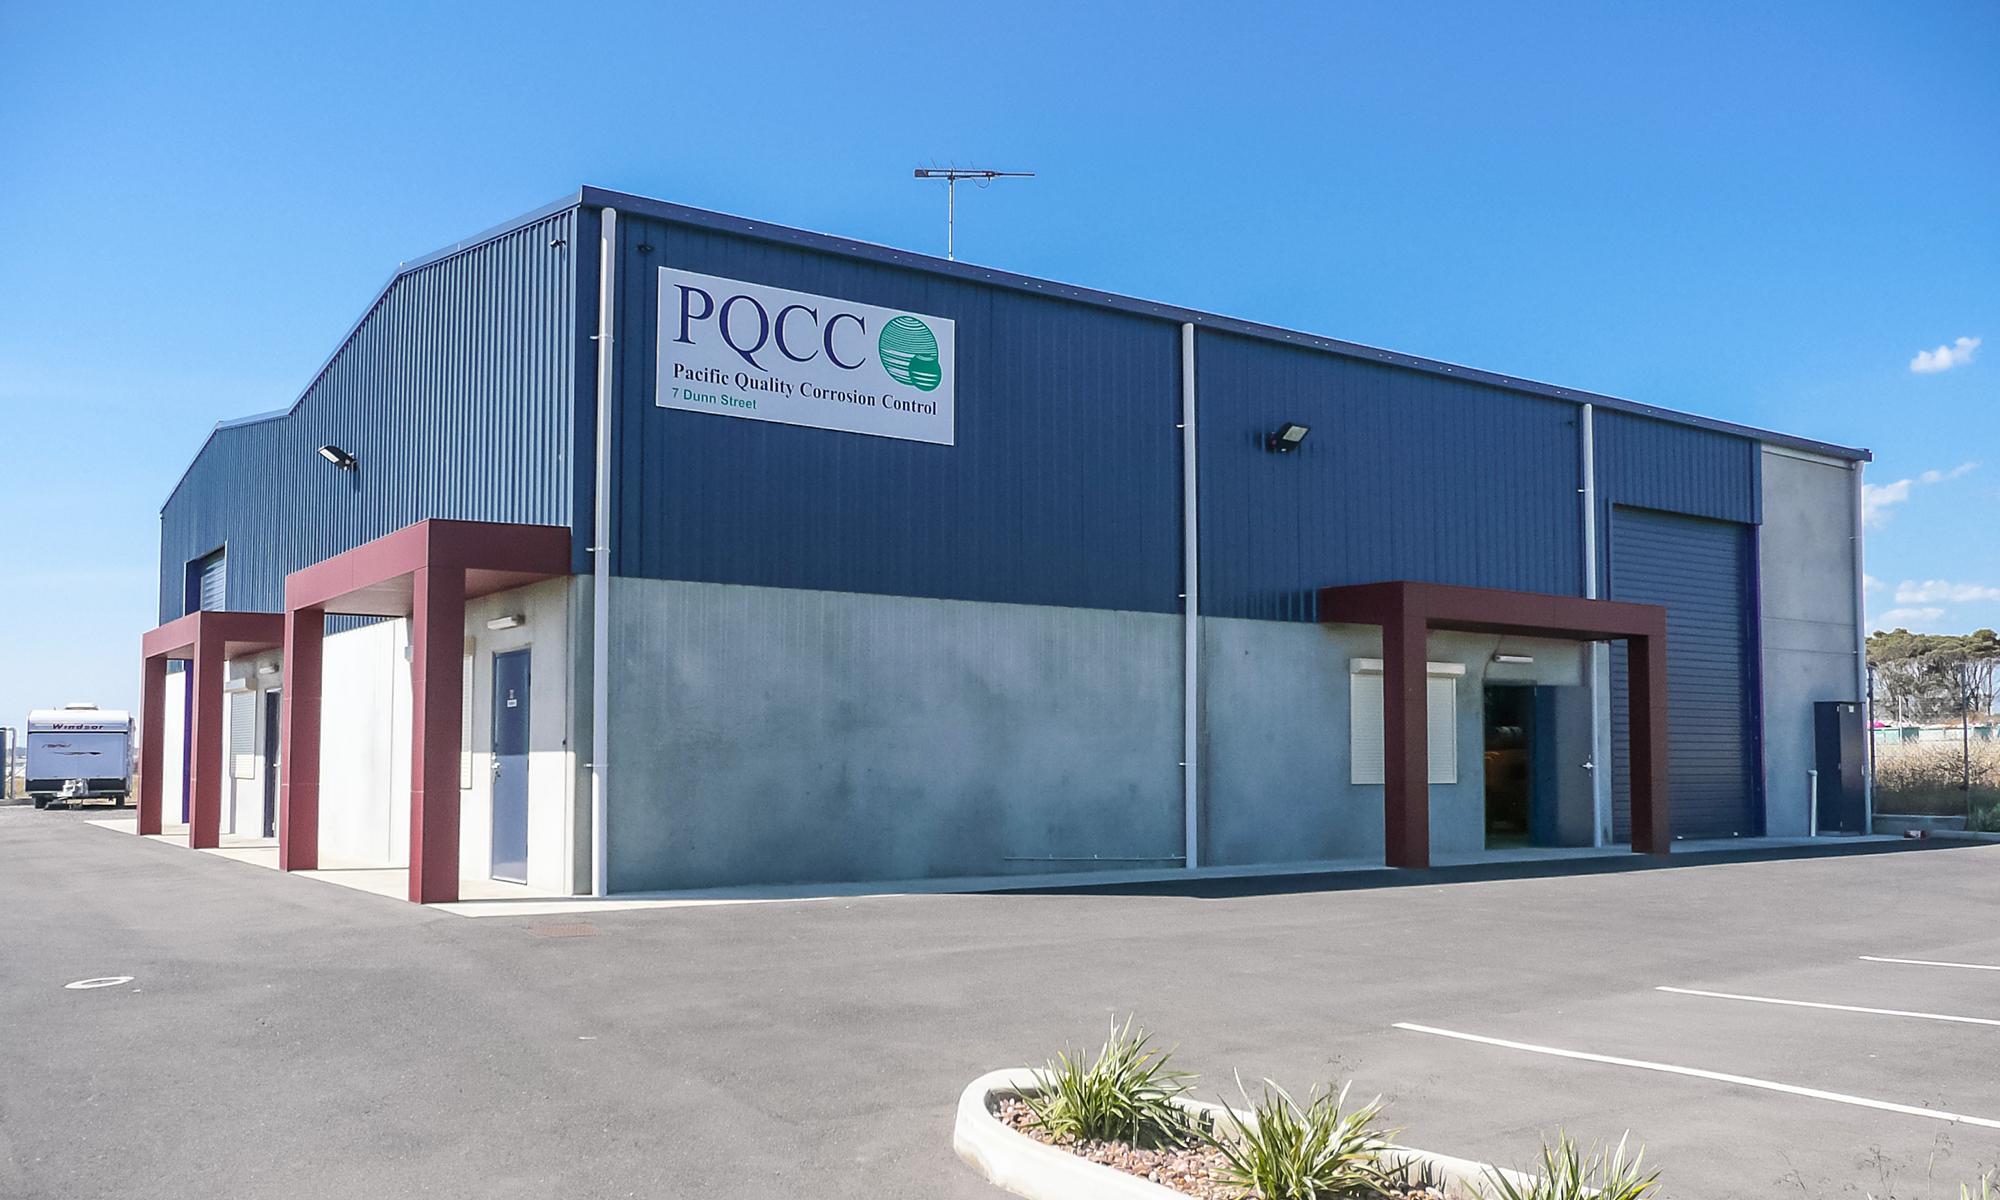 Pacific Quality Corrosion Control